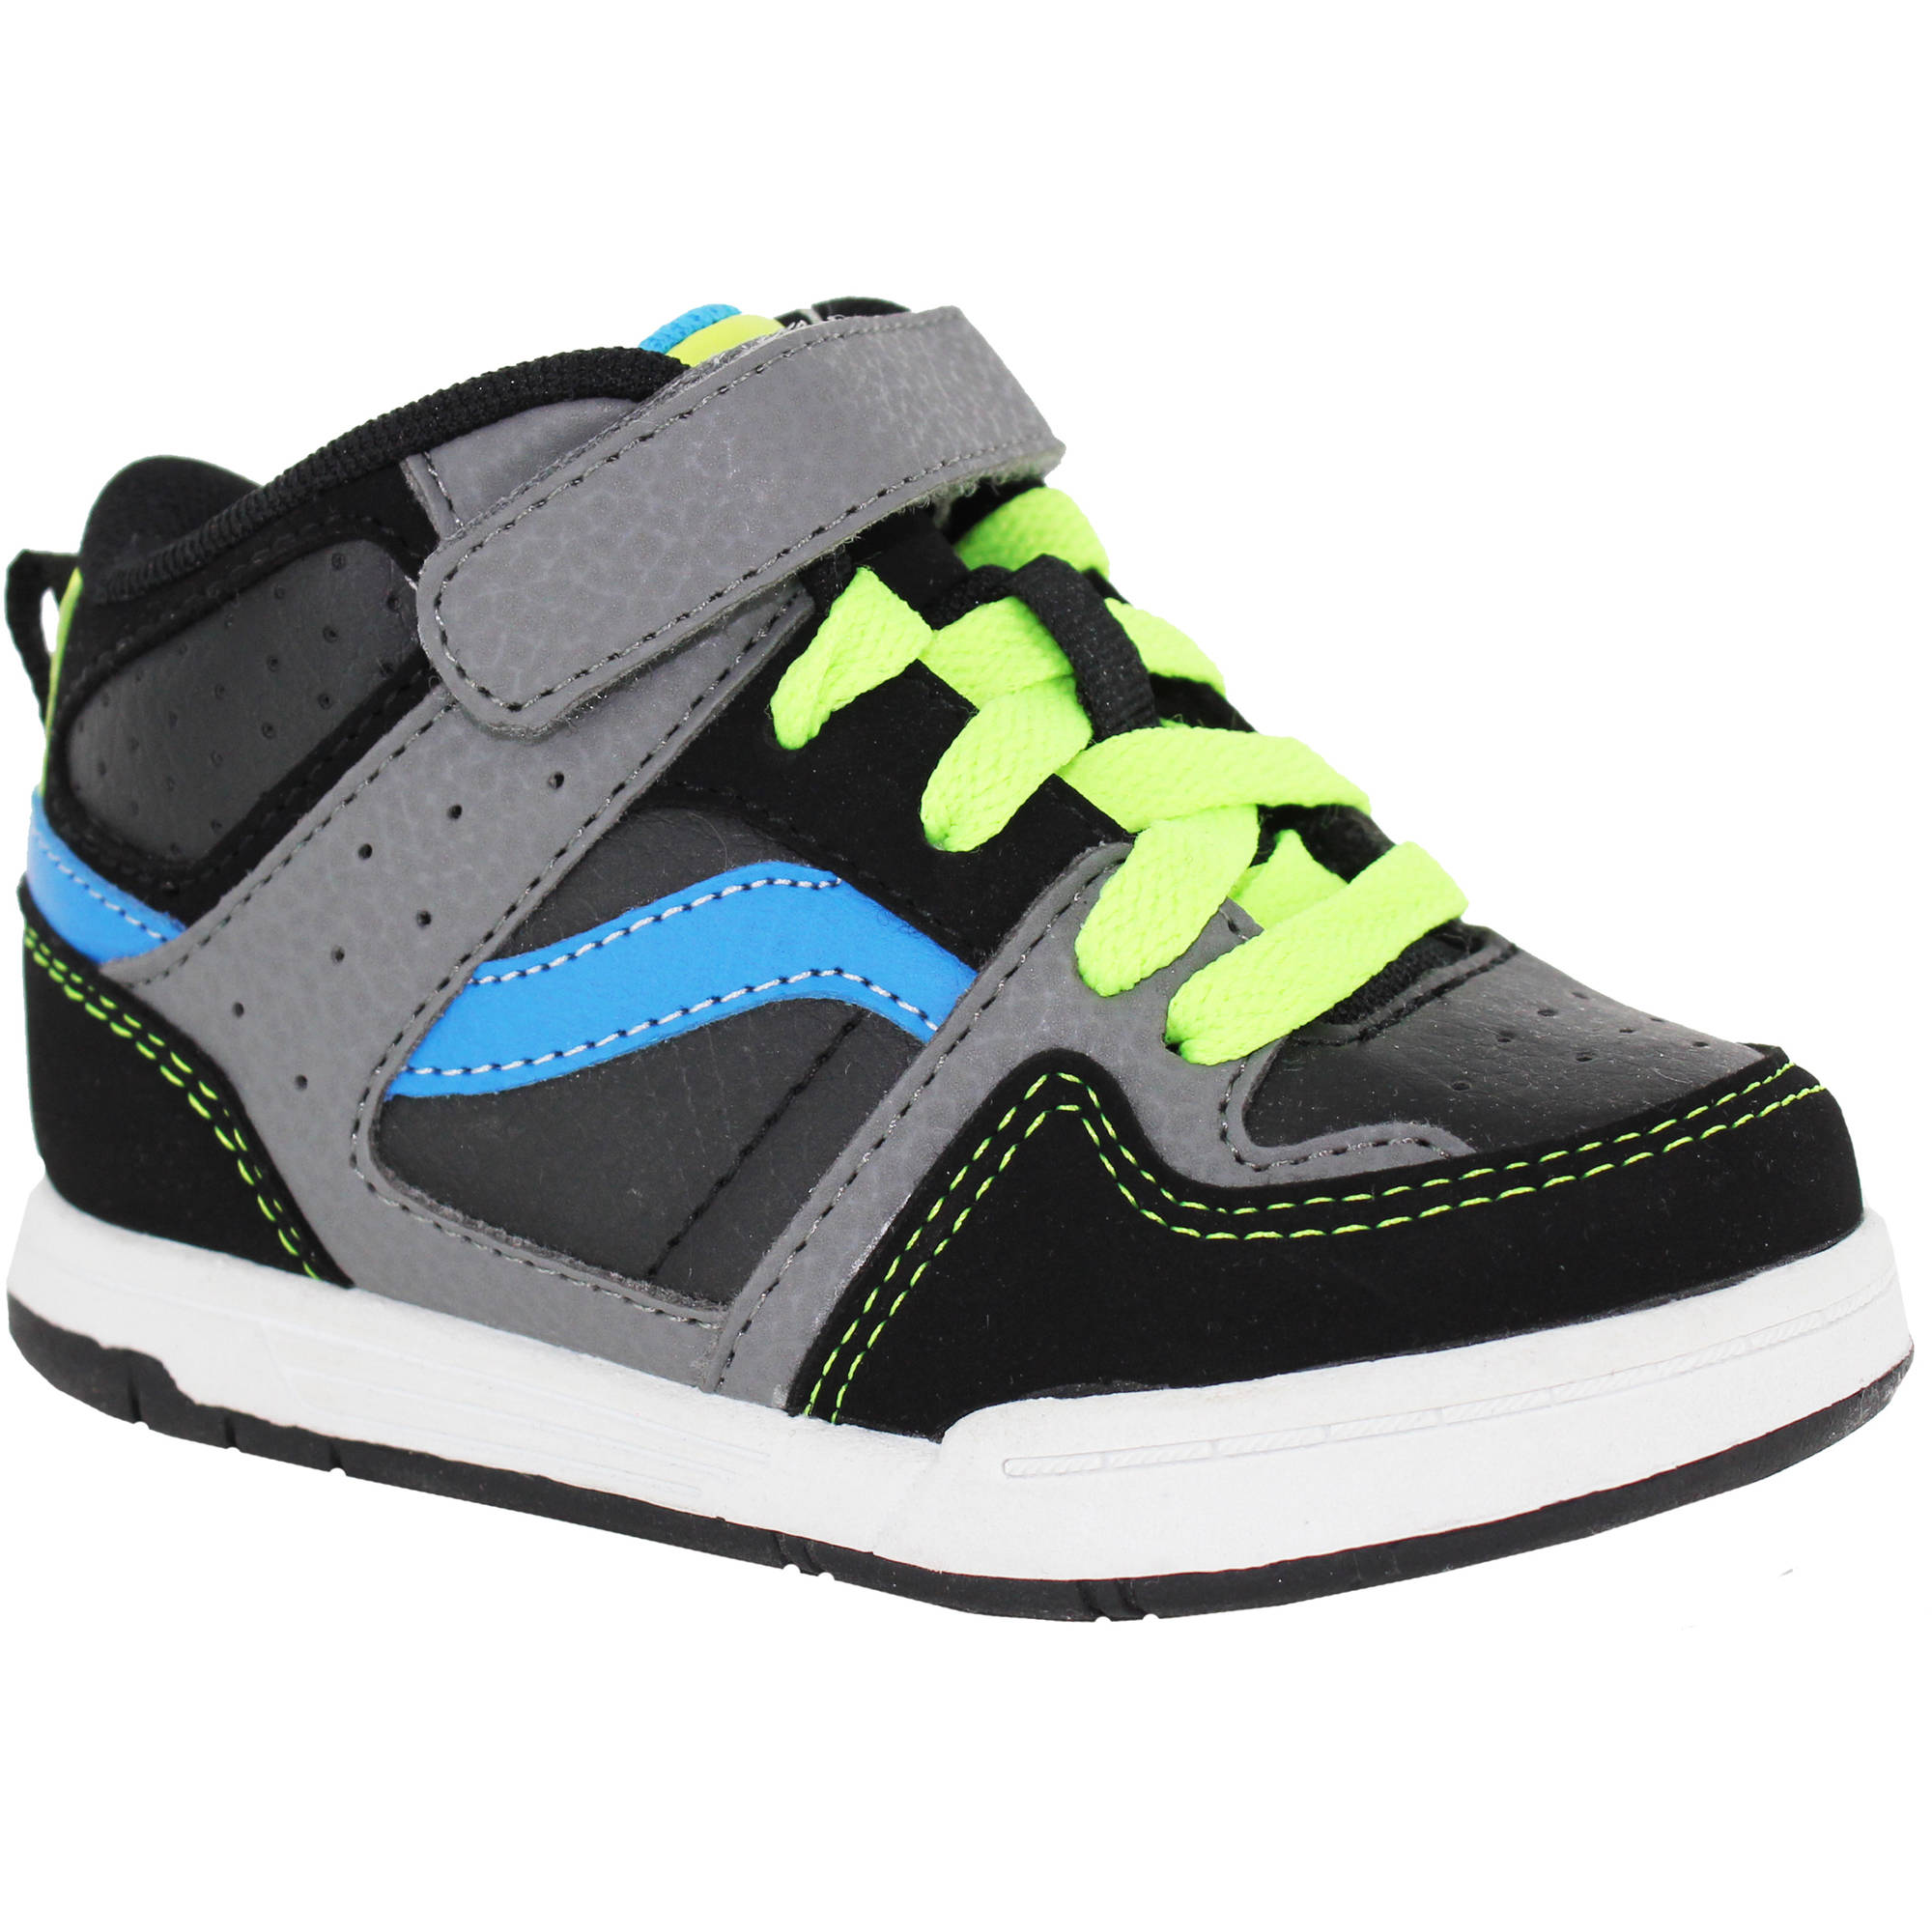 Skate shoes walmart - Skate Shoes Walmart 14